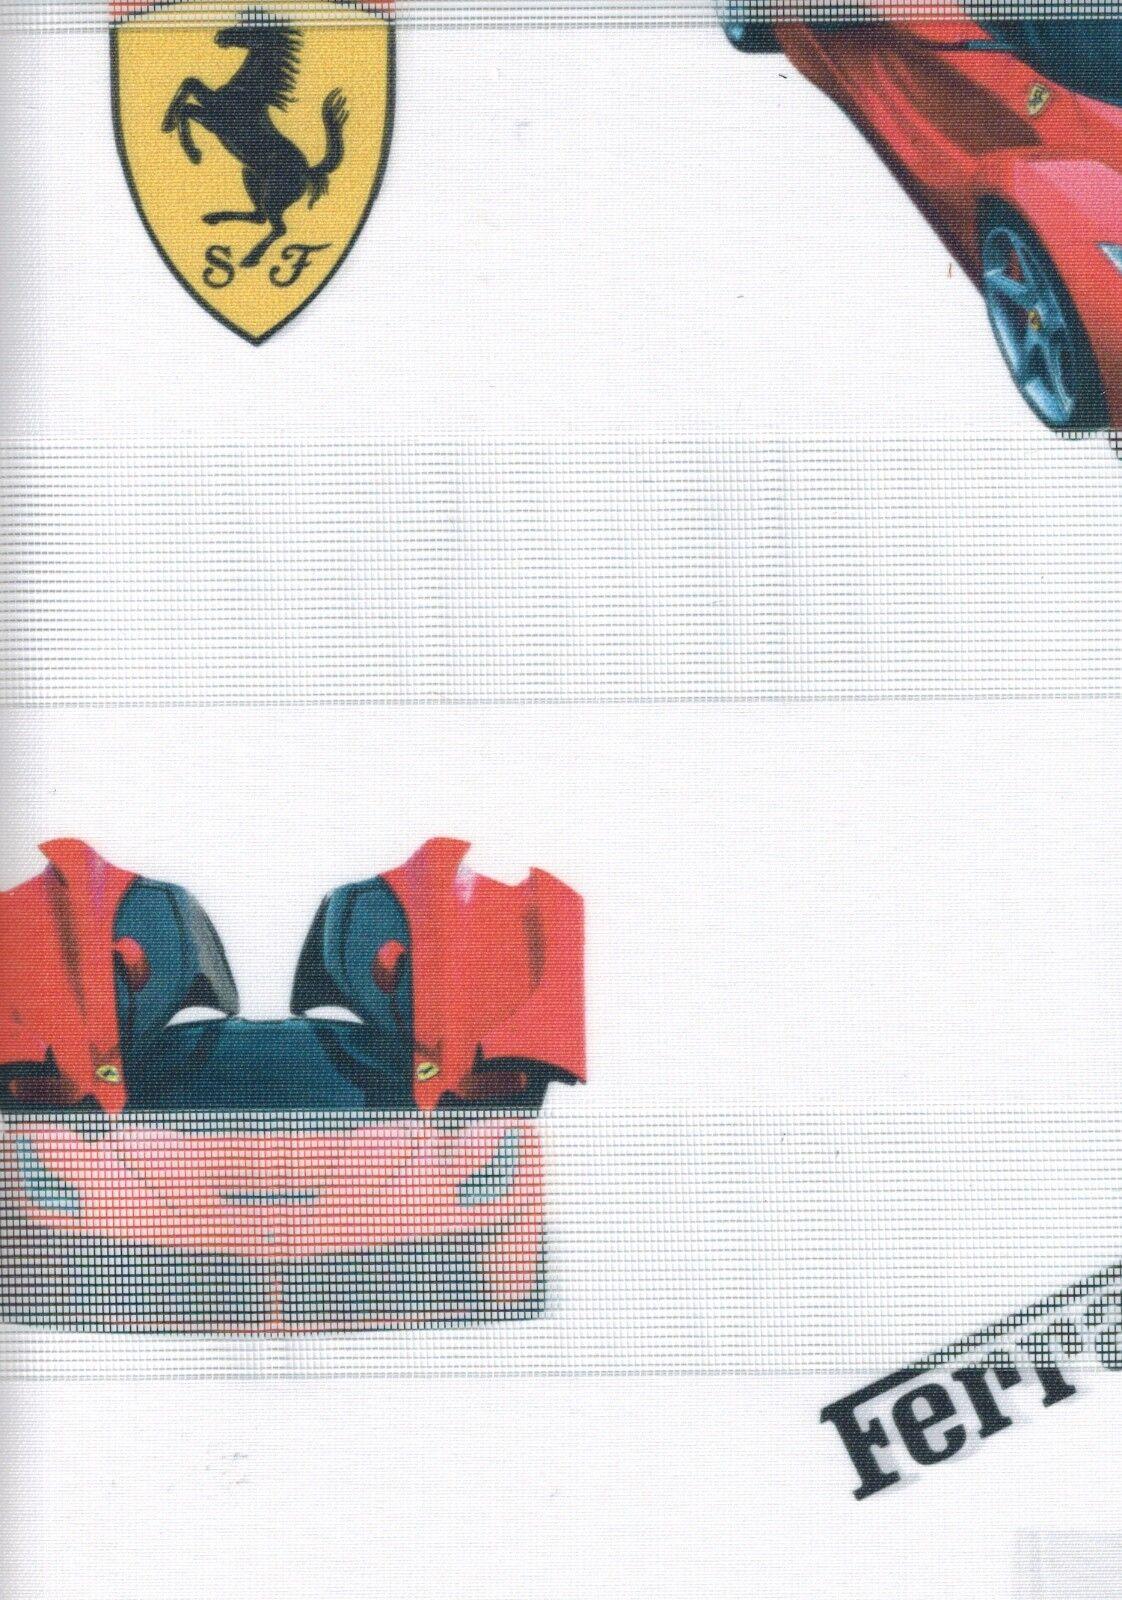 Art.  Ferrari Maßanfertigung Maßanfertigung Maßanfertigung KINDER Duo Rollo mit Kettenzug Doppelrollo Auto e3b882